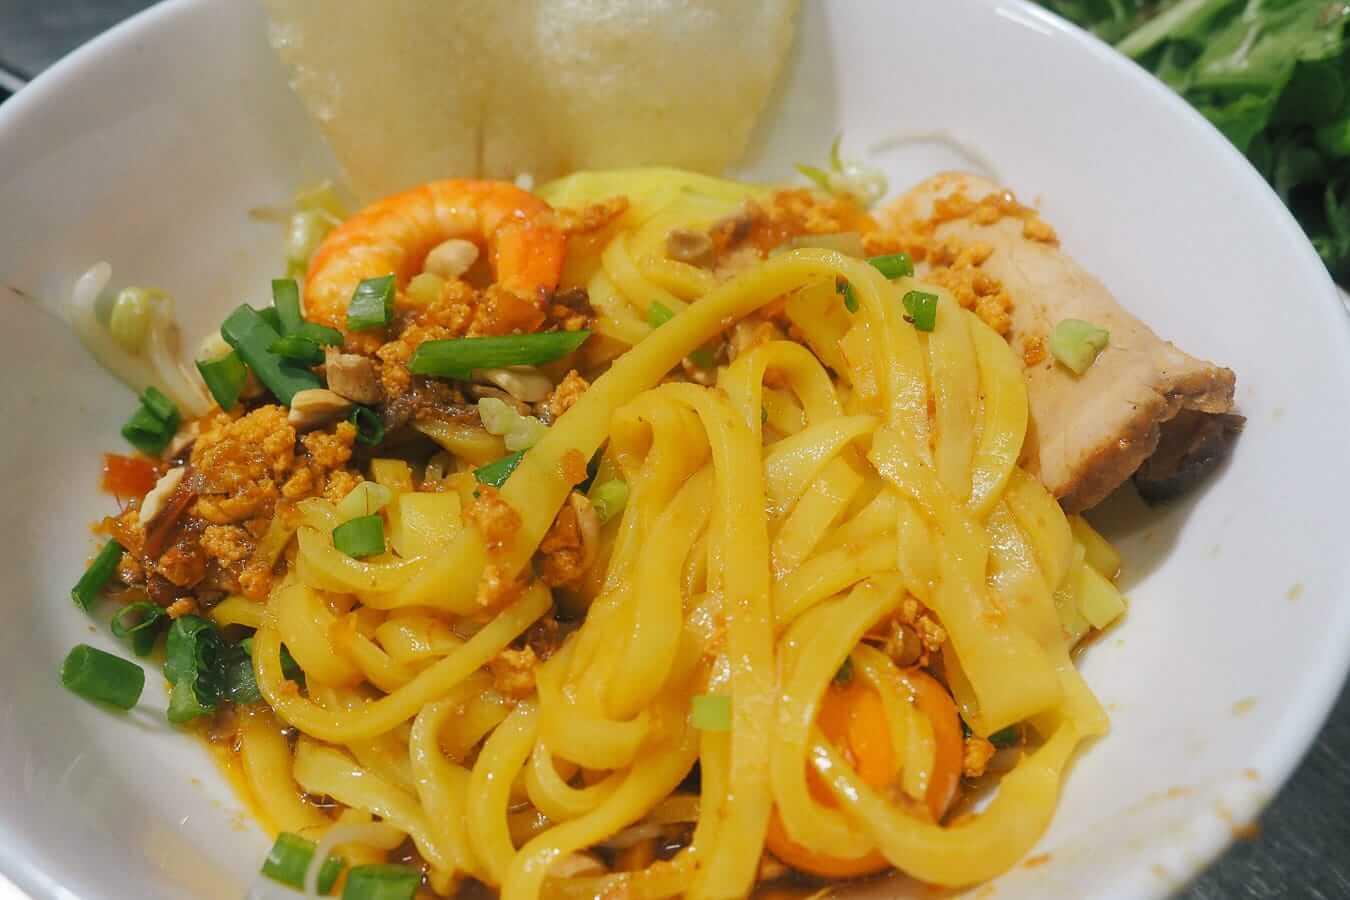 Mi Quang: Hoi An specialities